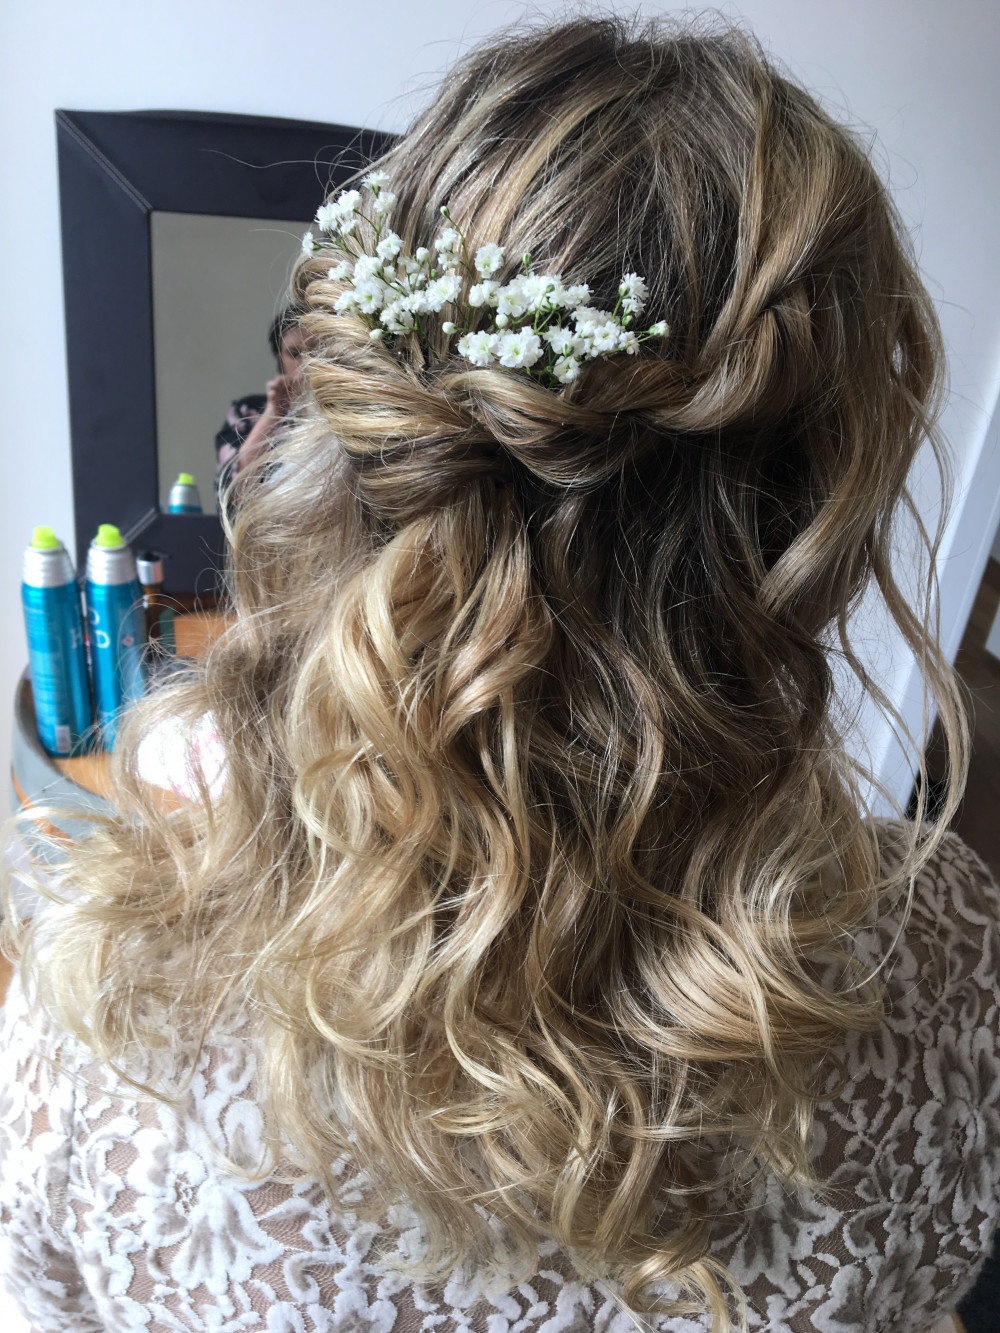 - Make Me Bridal Artist: Lisa gadsby wedding hair specialist . Photography by: Lisa gadsby . #halfuphair #curls #gypsophila #soft #bridesmaidhair #wavyhair